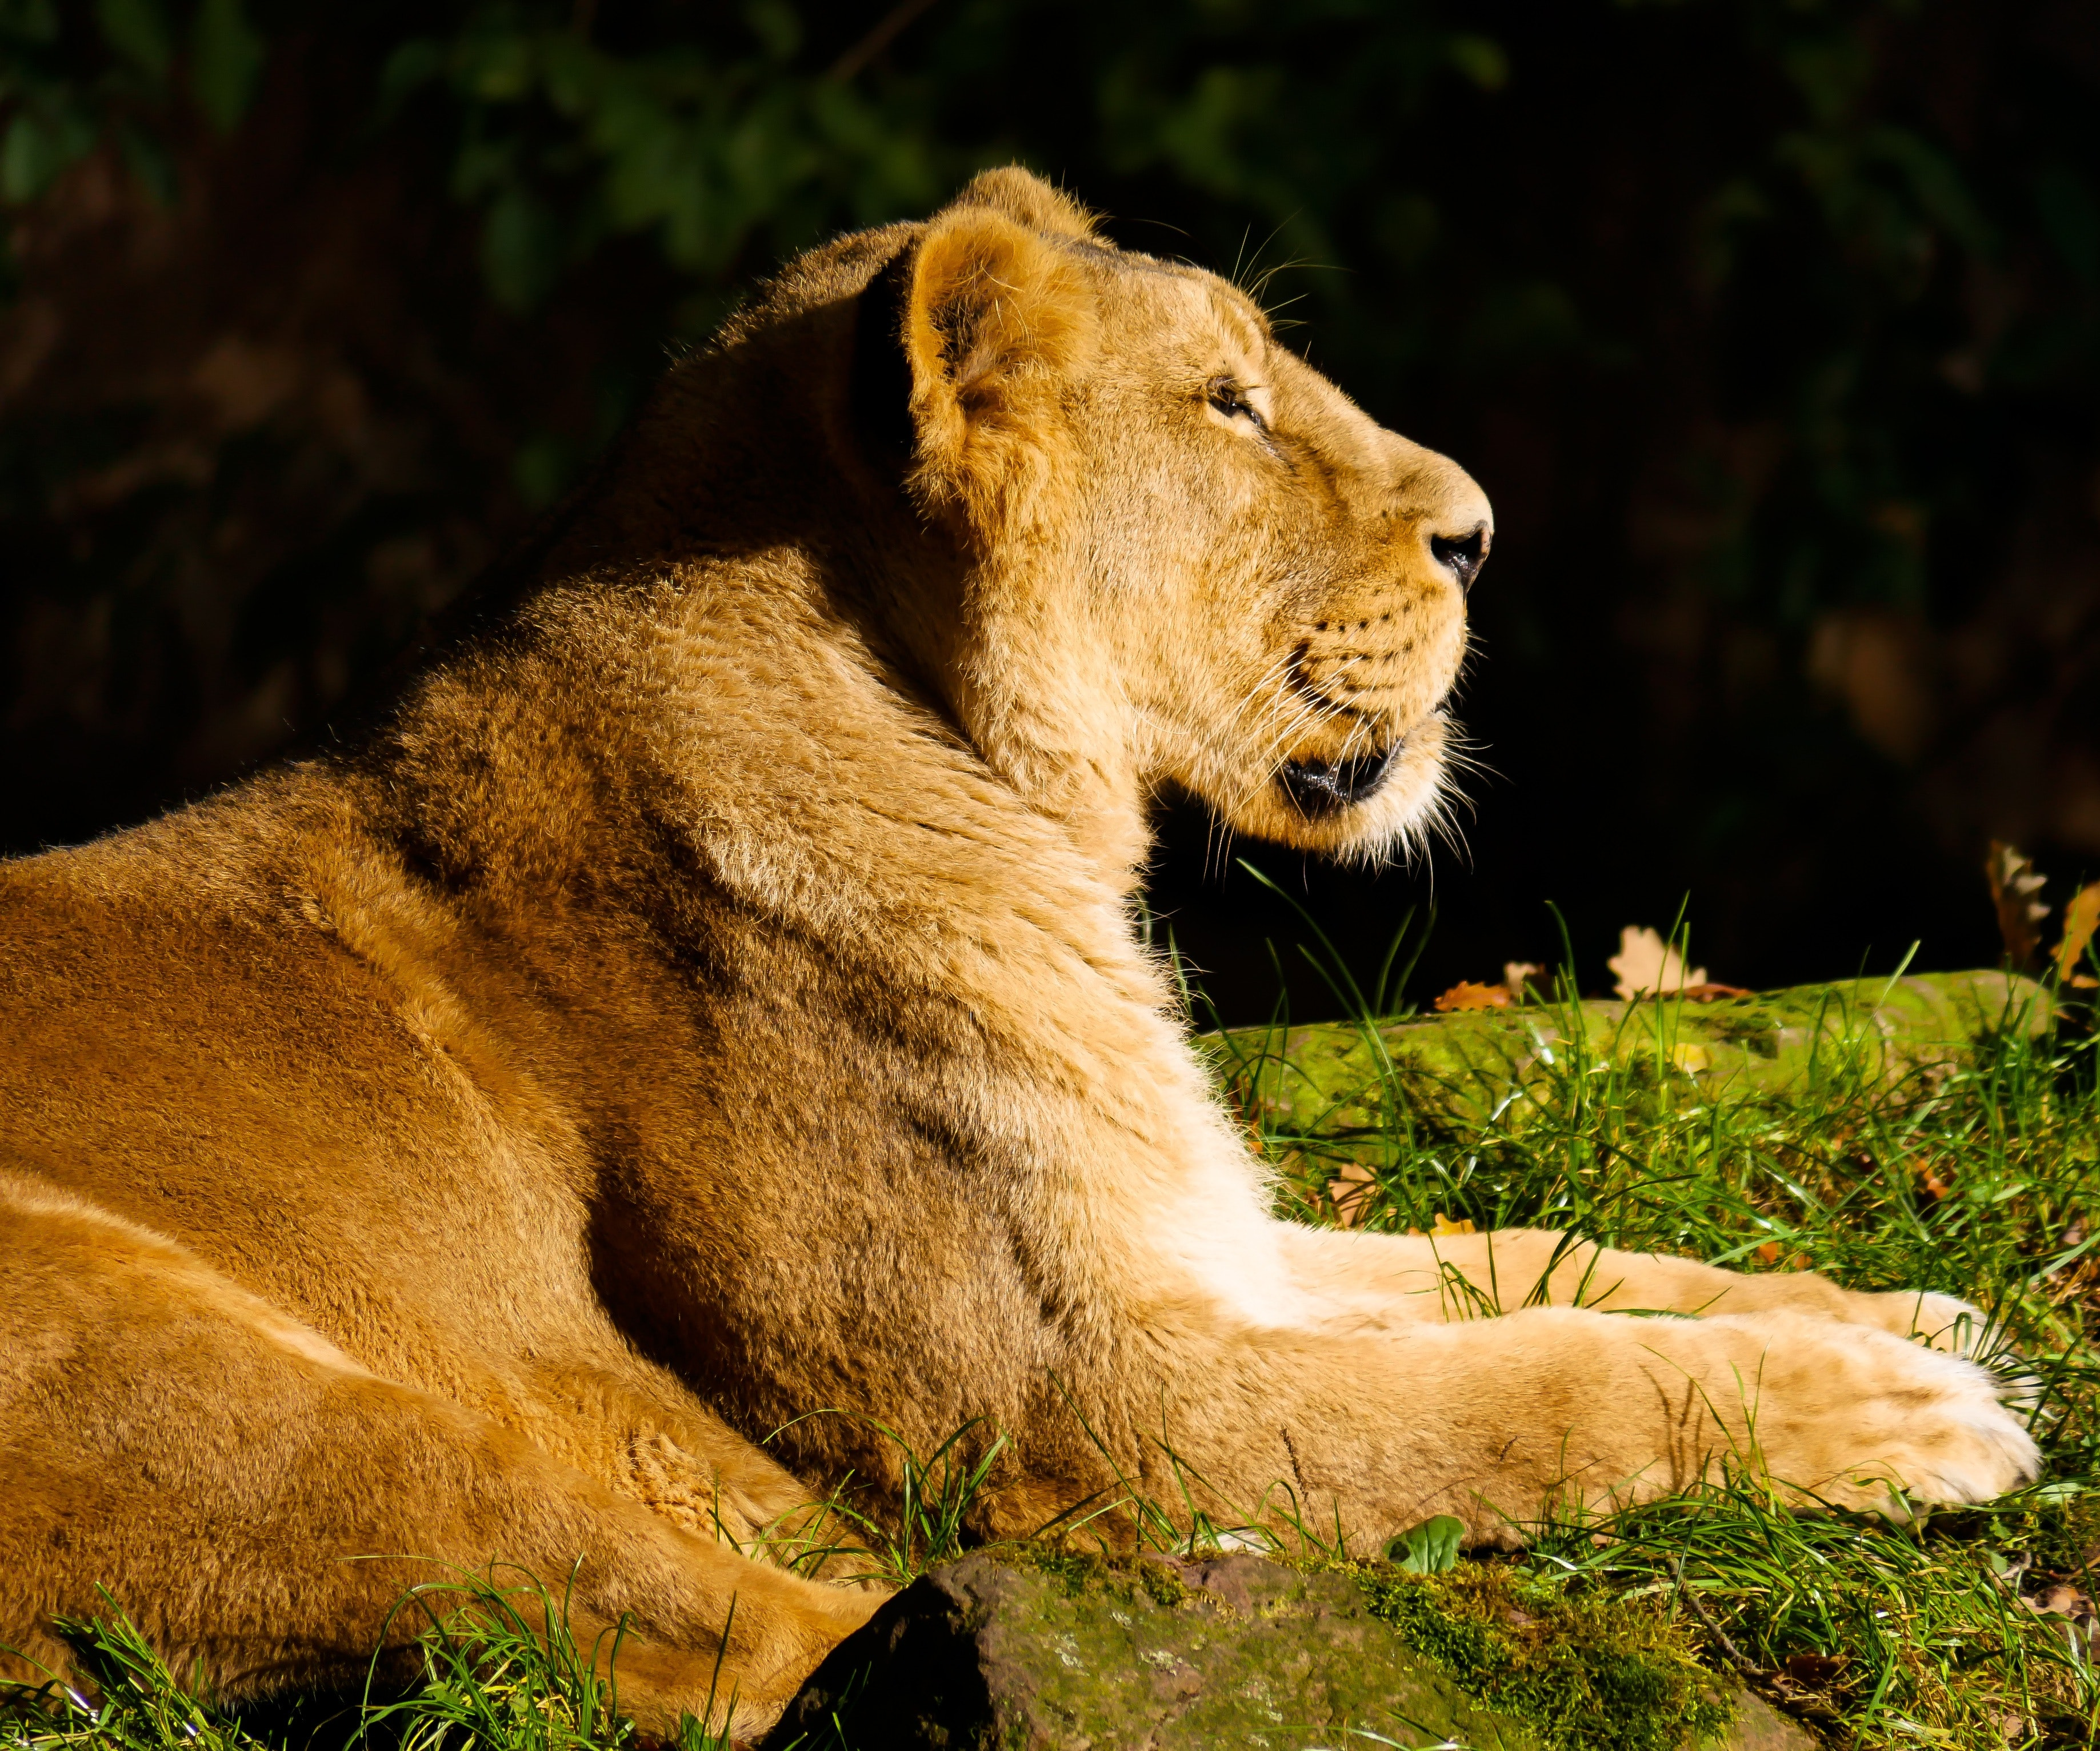 Gray Lioness 183 Free Stock Photo